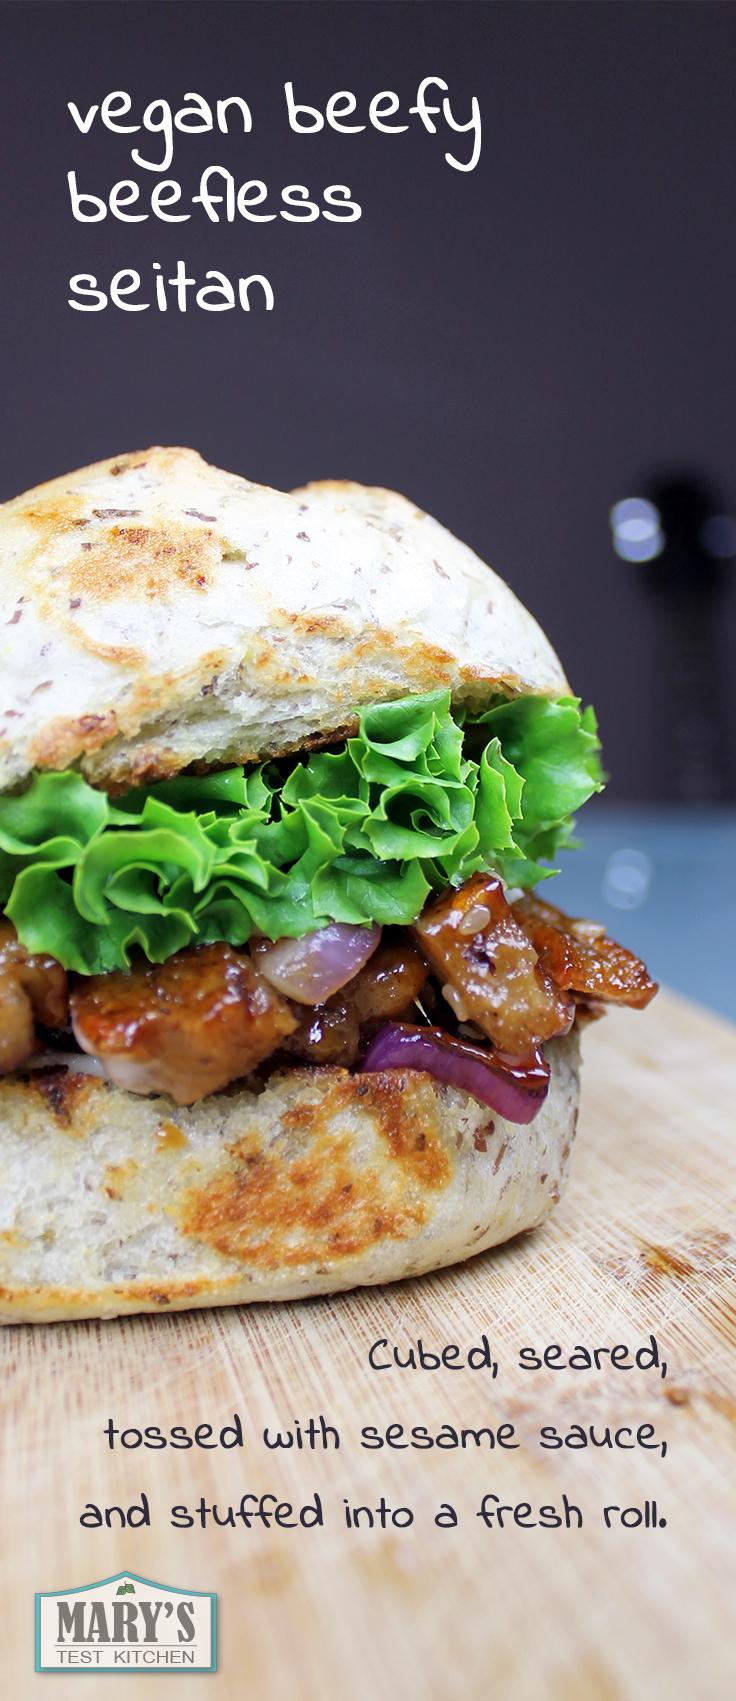 pin-vegan-beefy-sesame-seitan-sandwich